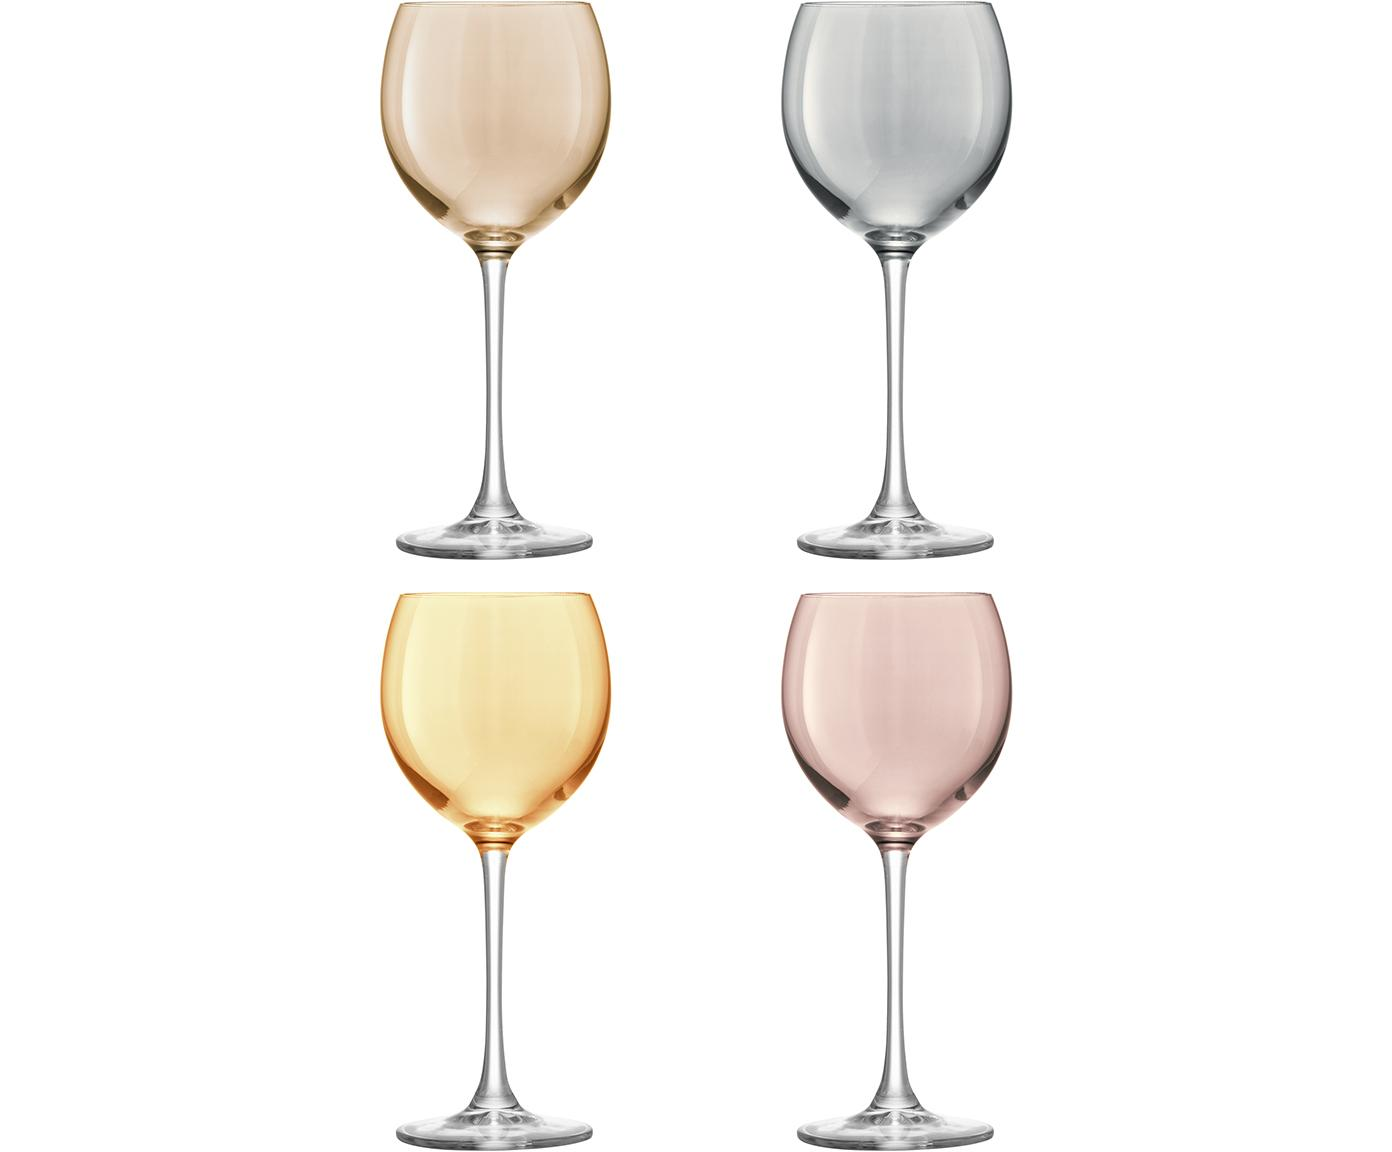 Copas de vino pintandas a mano Polka, 4pzas., Vidrio, Amarillo, castaño, gris, marrón, Ø 9 x Al 21 cm